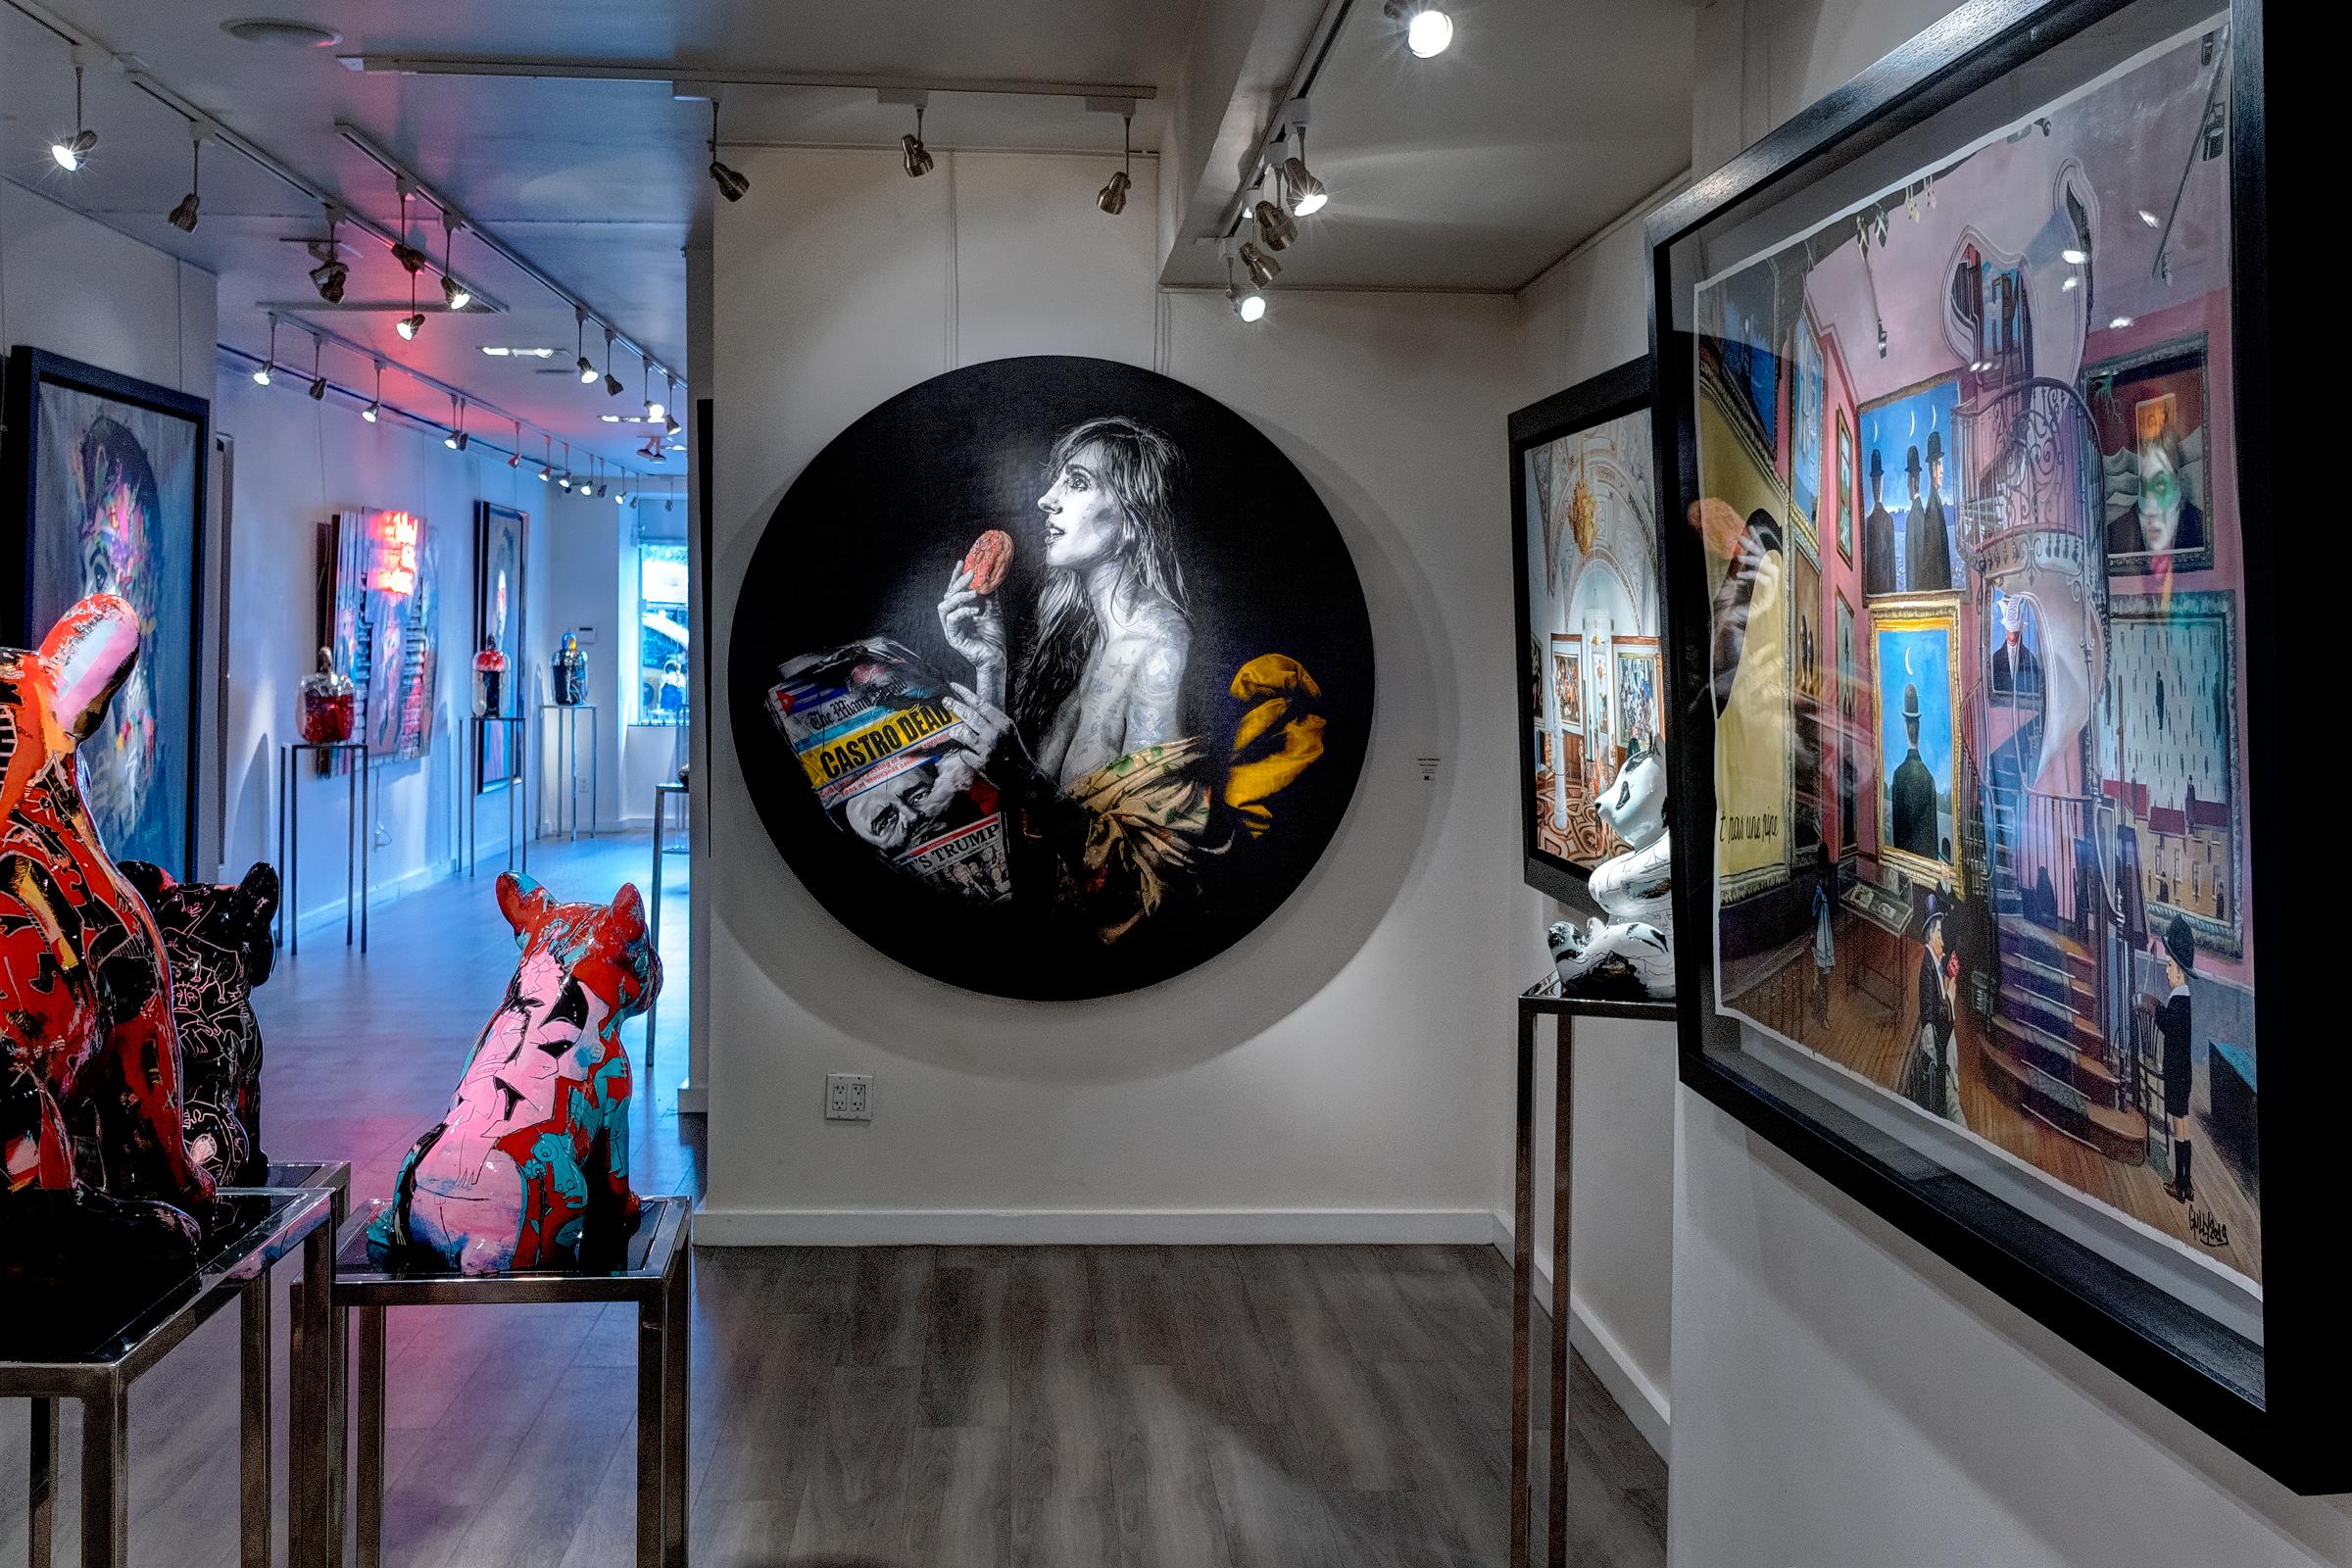 фото и видео съемка лоя картинной галереи в Нью-Йорке